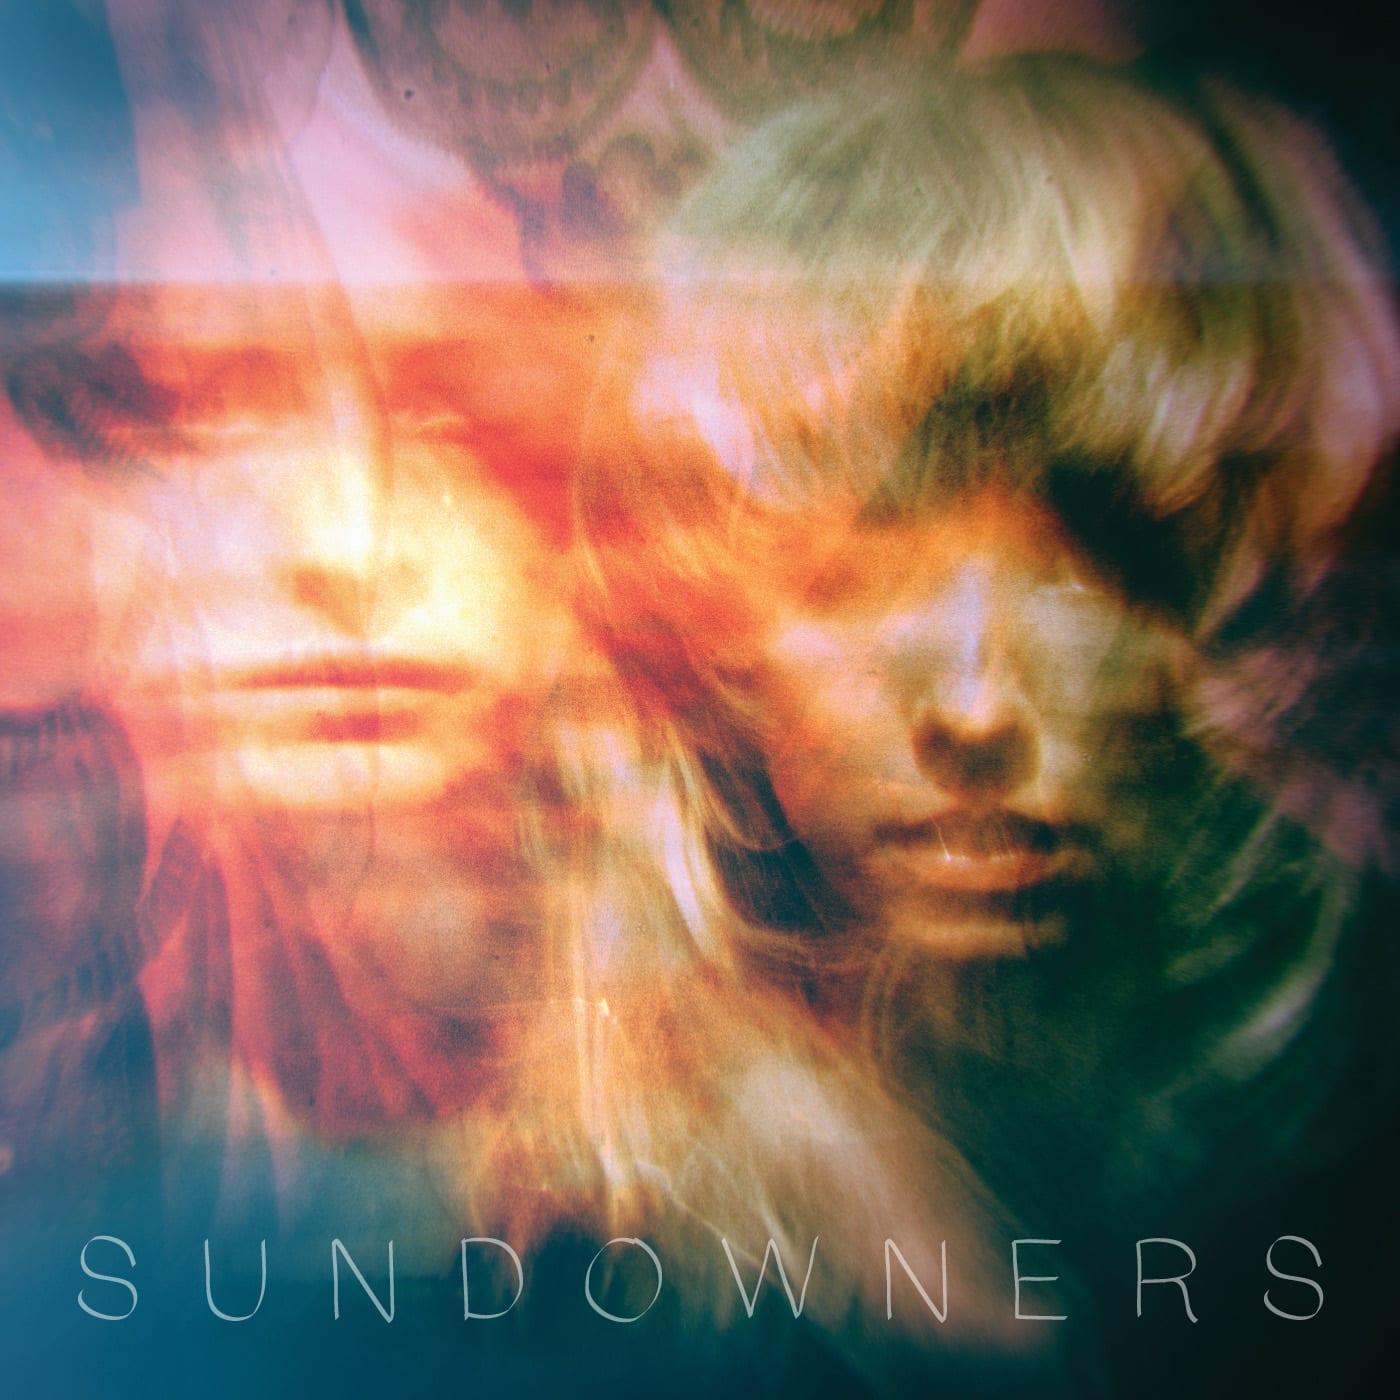 Album Review: Sundowners (Self-Titled)